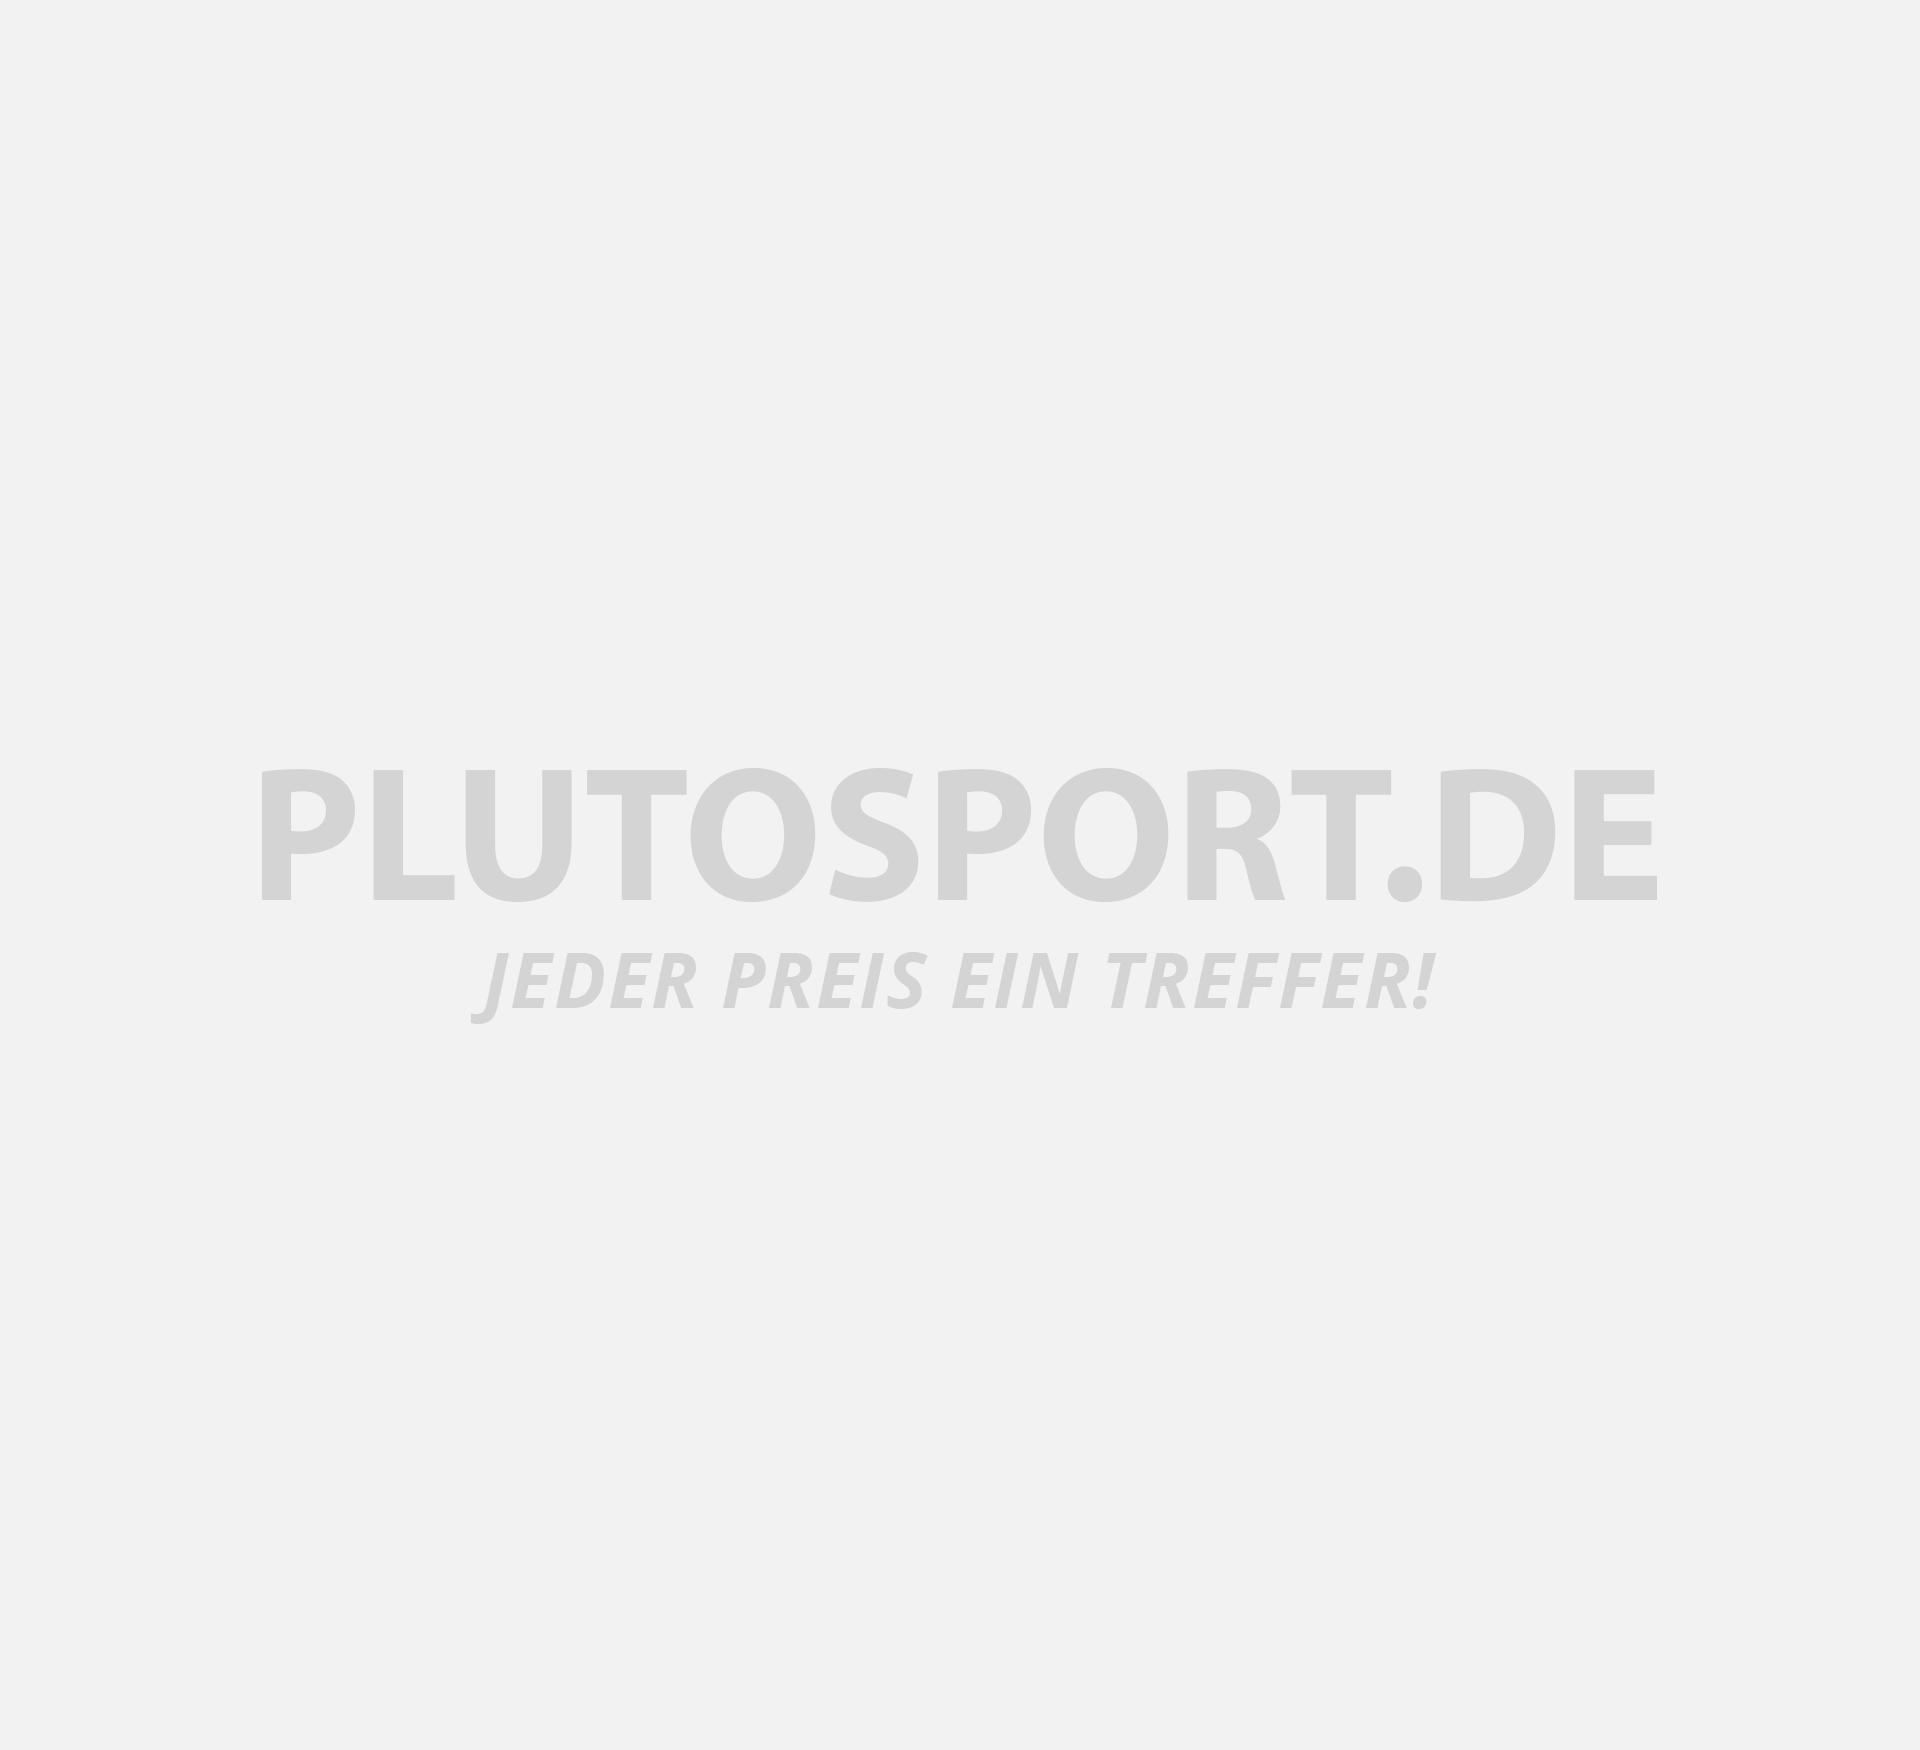 Diesel Shawn Boxershorts Herren (3er-Pack)